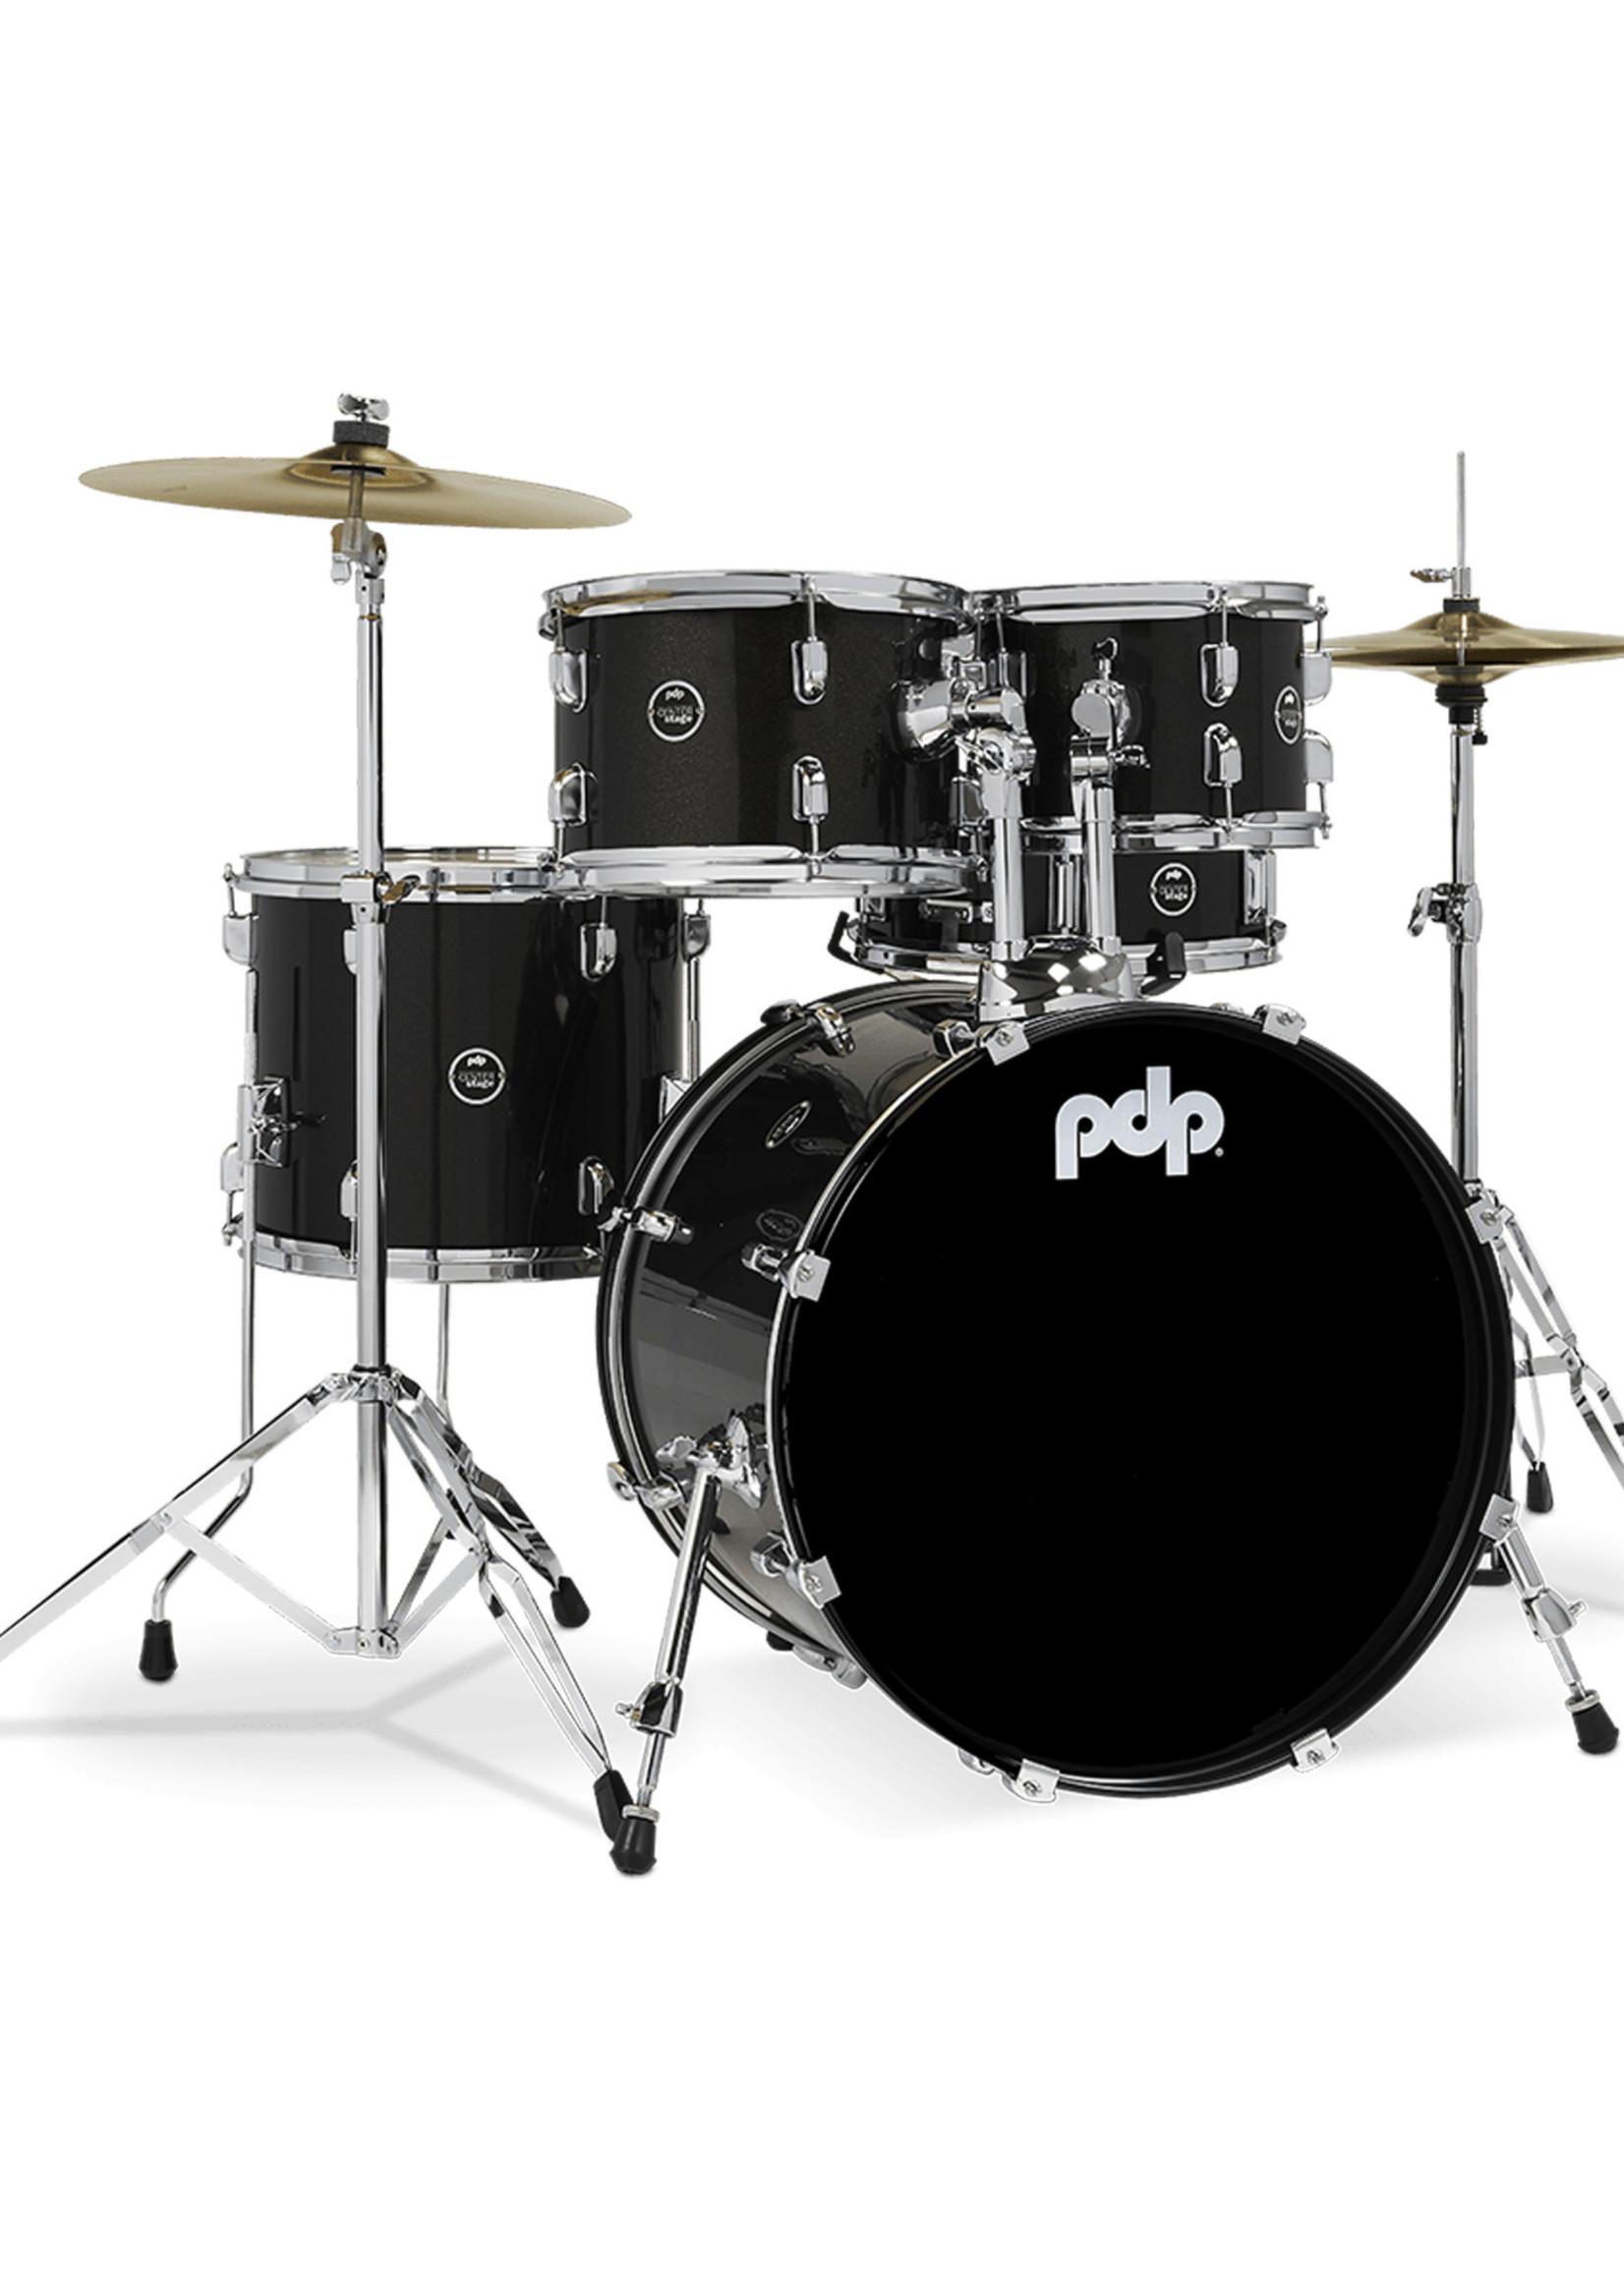 PDP PDP Center Stage 5-Piece Kit Iridescent Black Sparkle